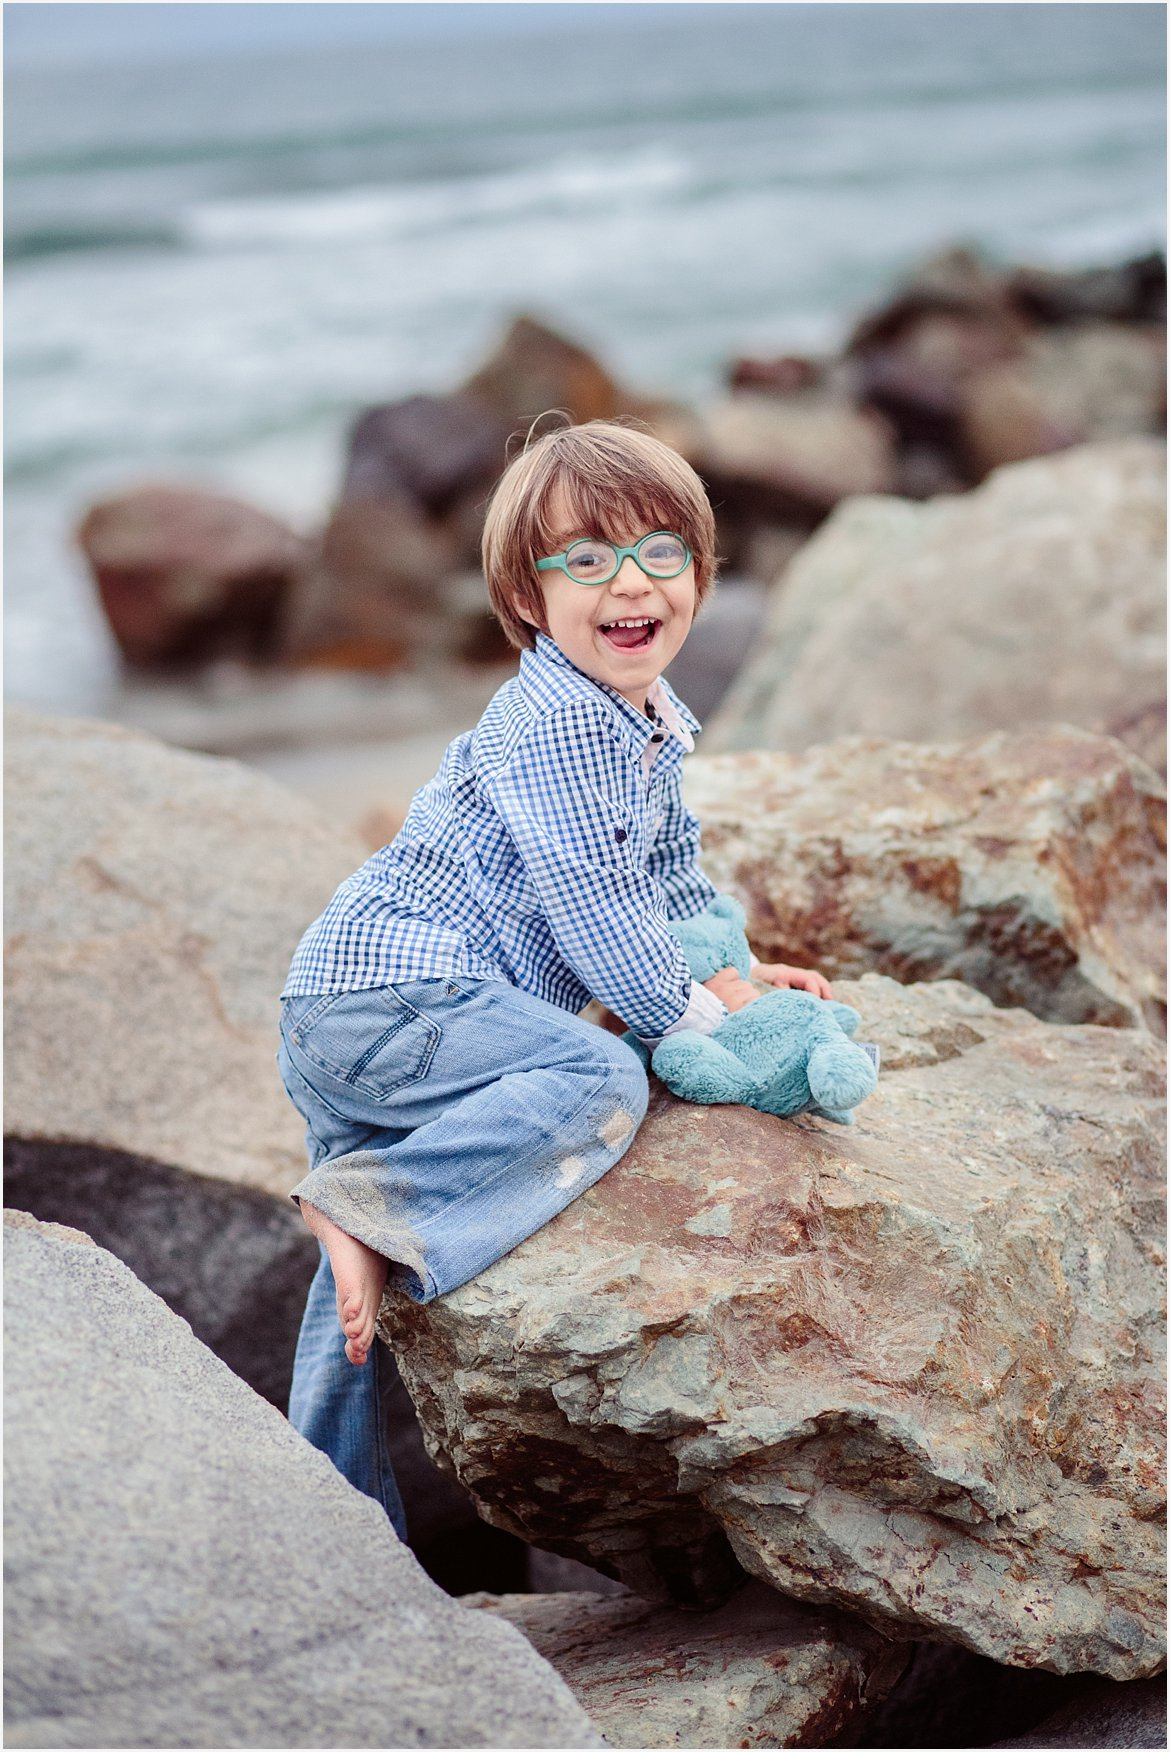 Child on the Rocks | San Diego Beach Photography